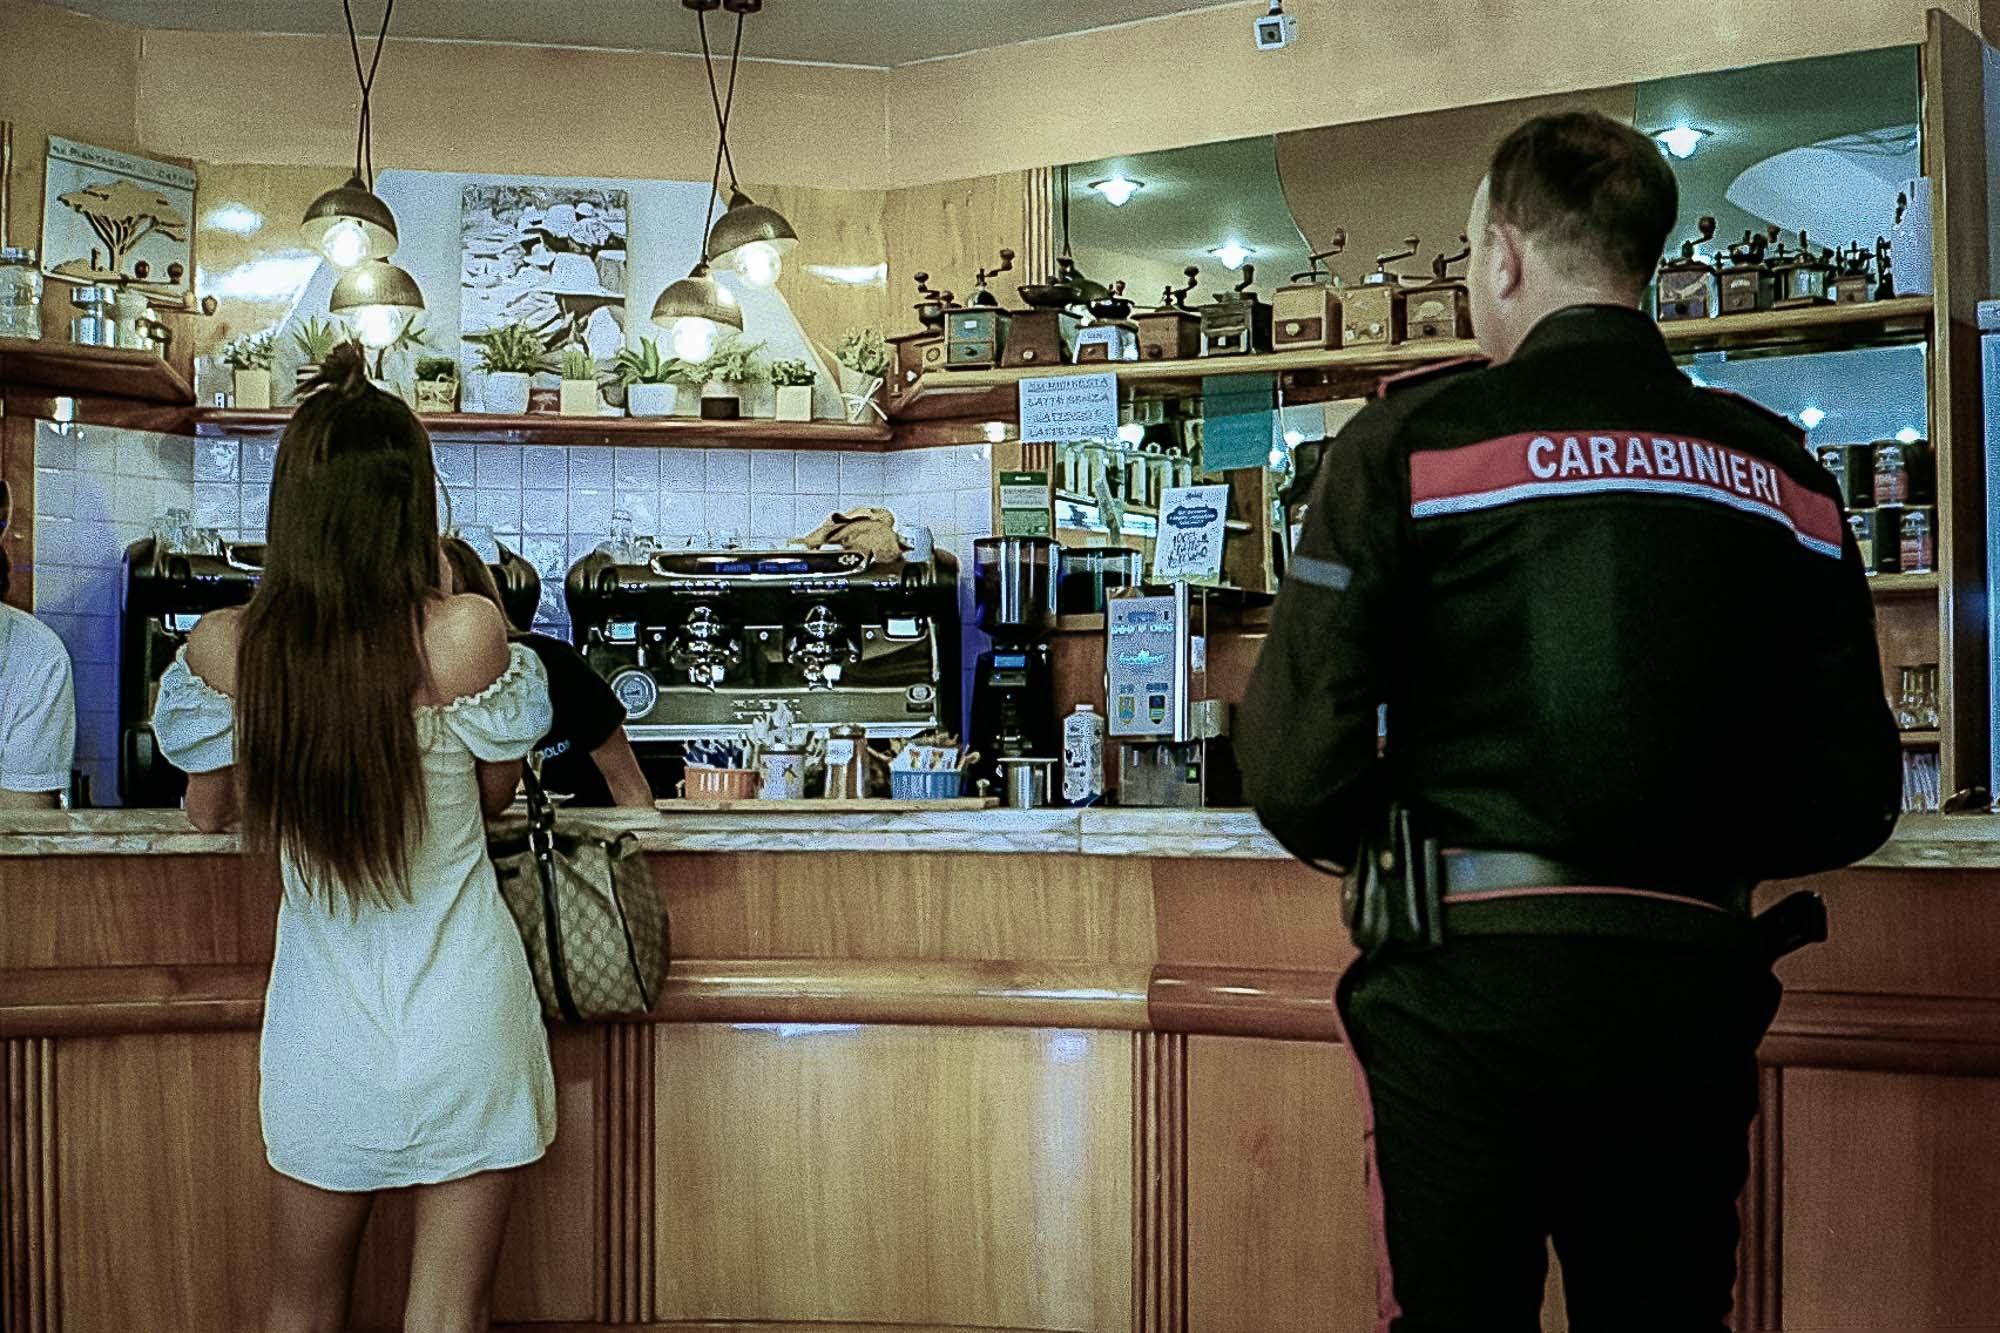 Augenblick in einer italienischen Bar (M6ttl, Kodak Color 200)